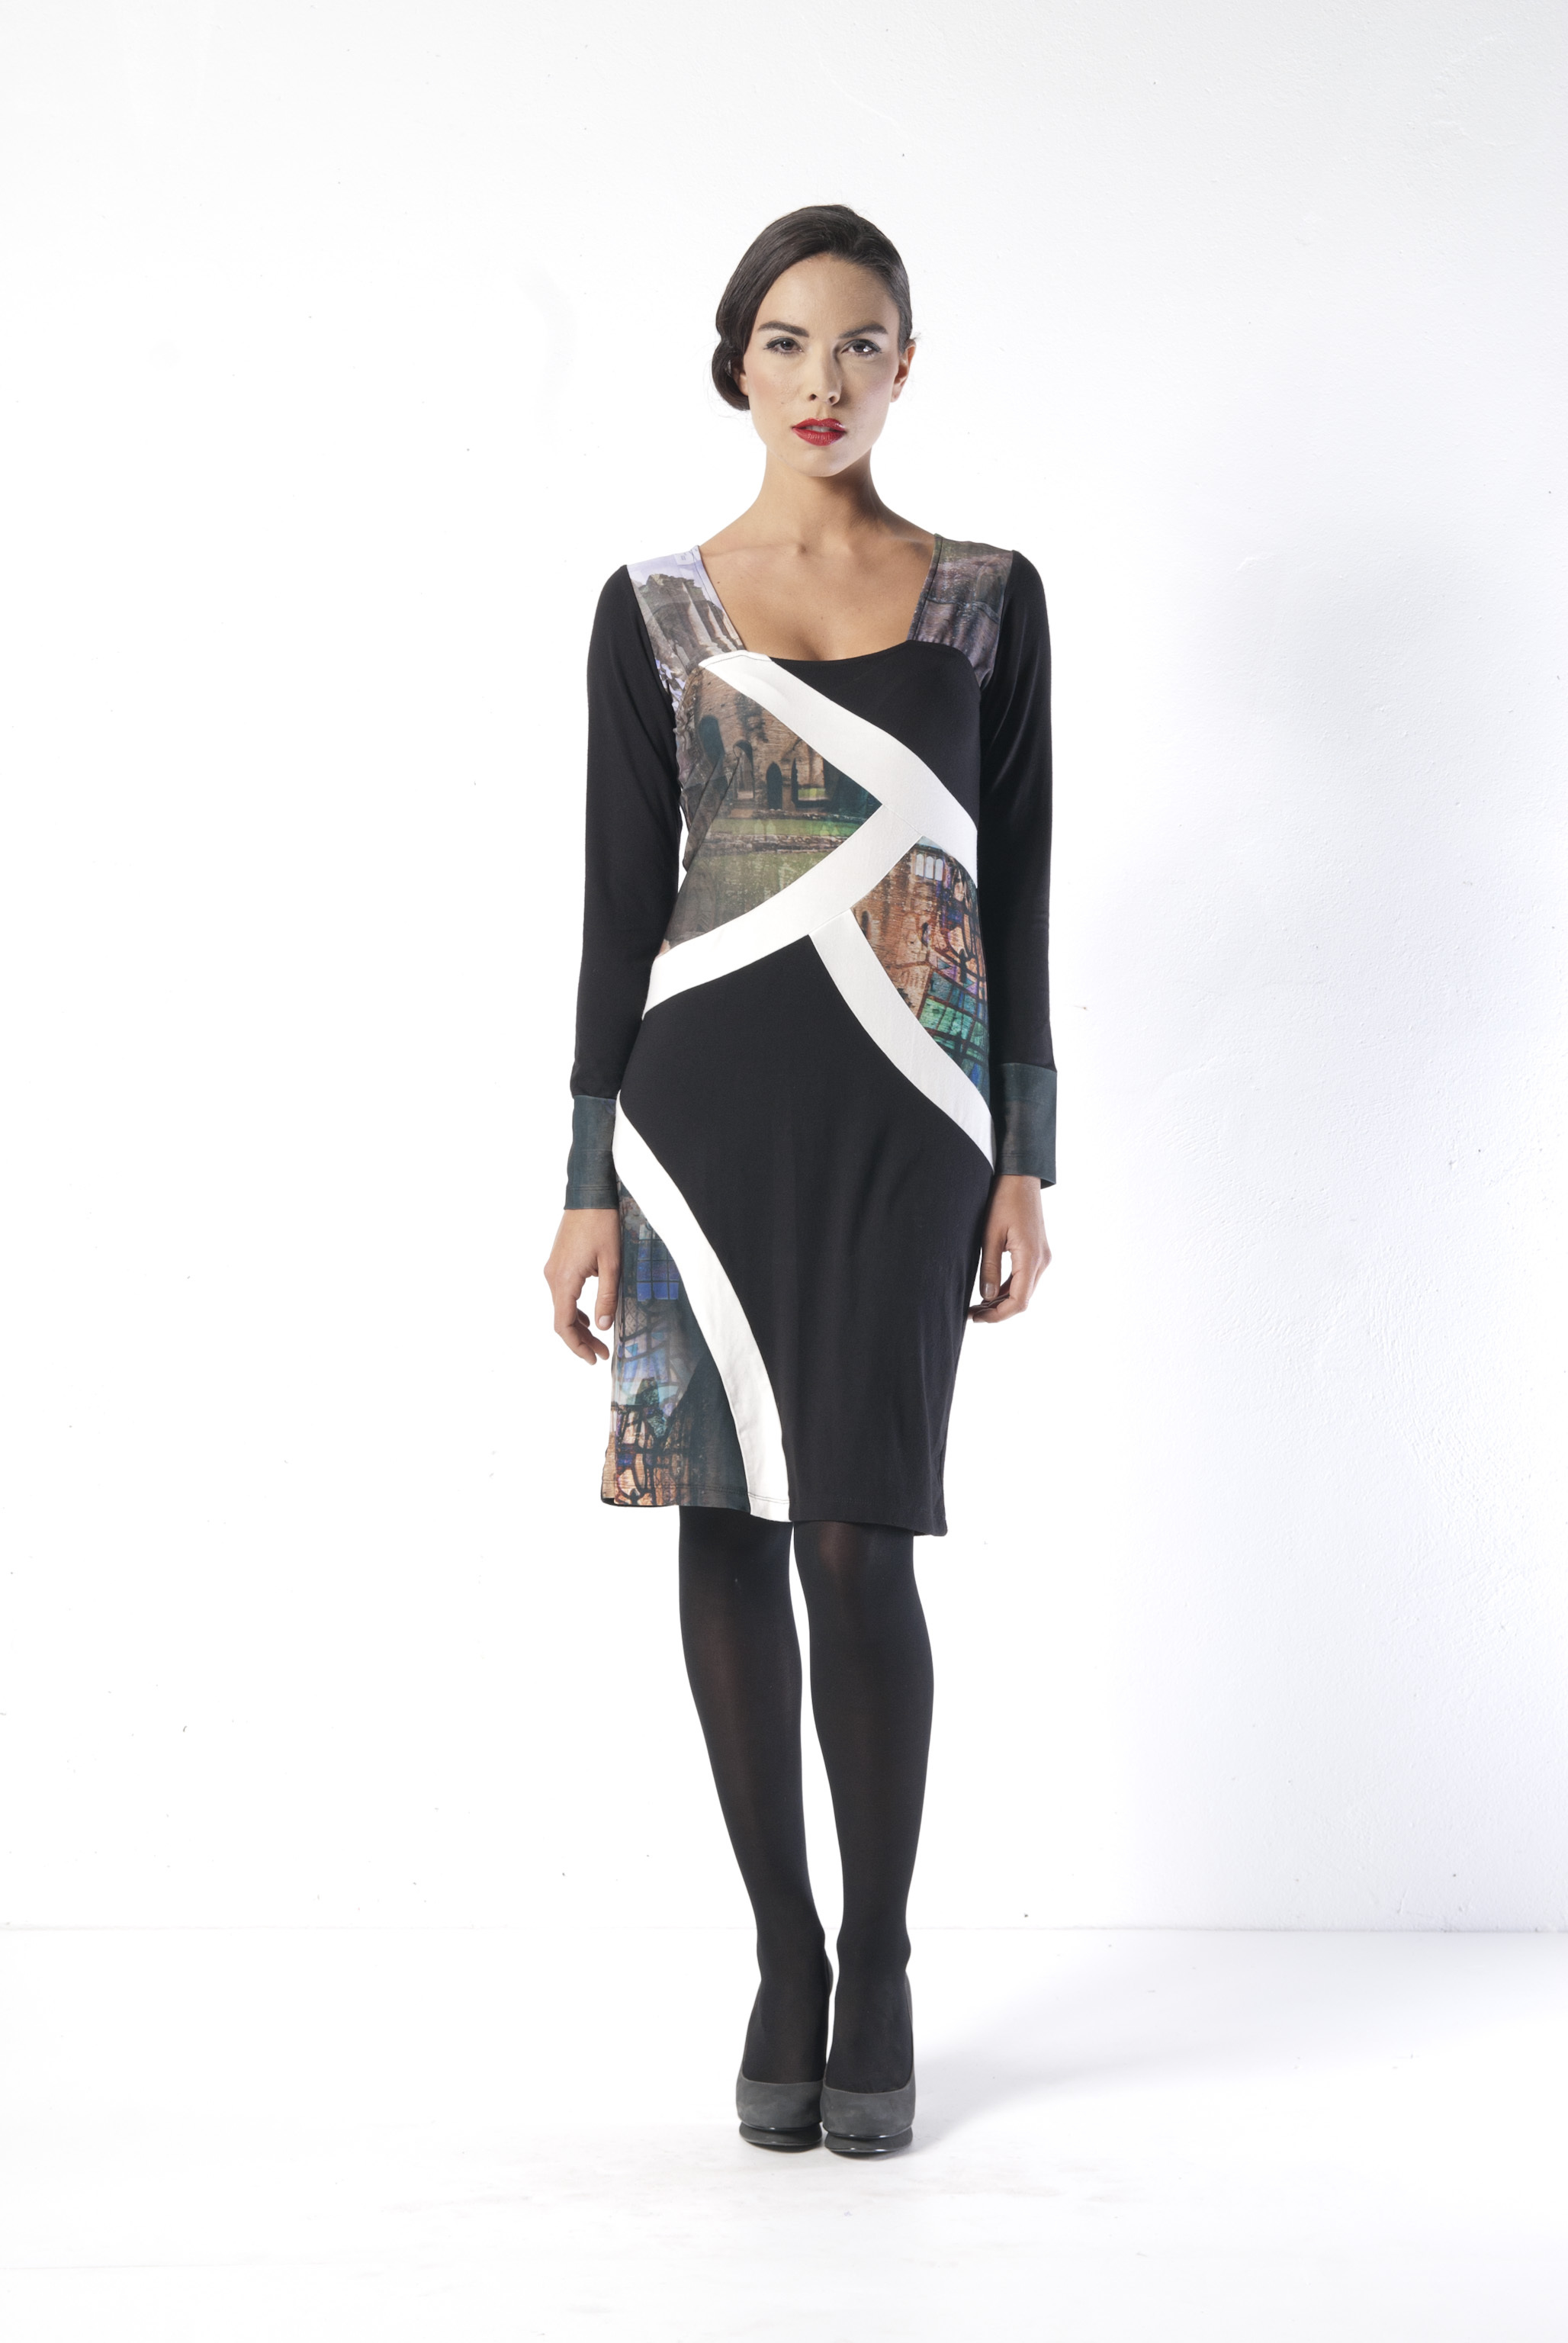 Les Fees Du Vent Couture: Notre Dame At A Glance Dress (Hot Fave, It's Back!)